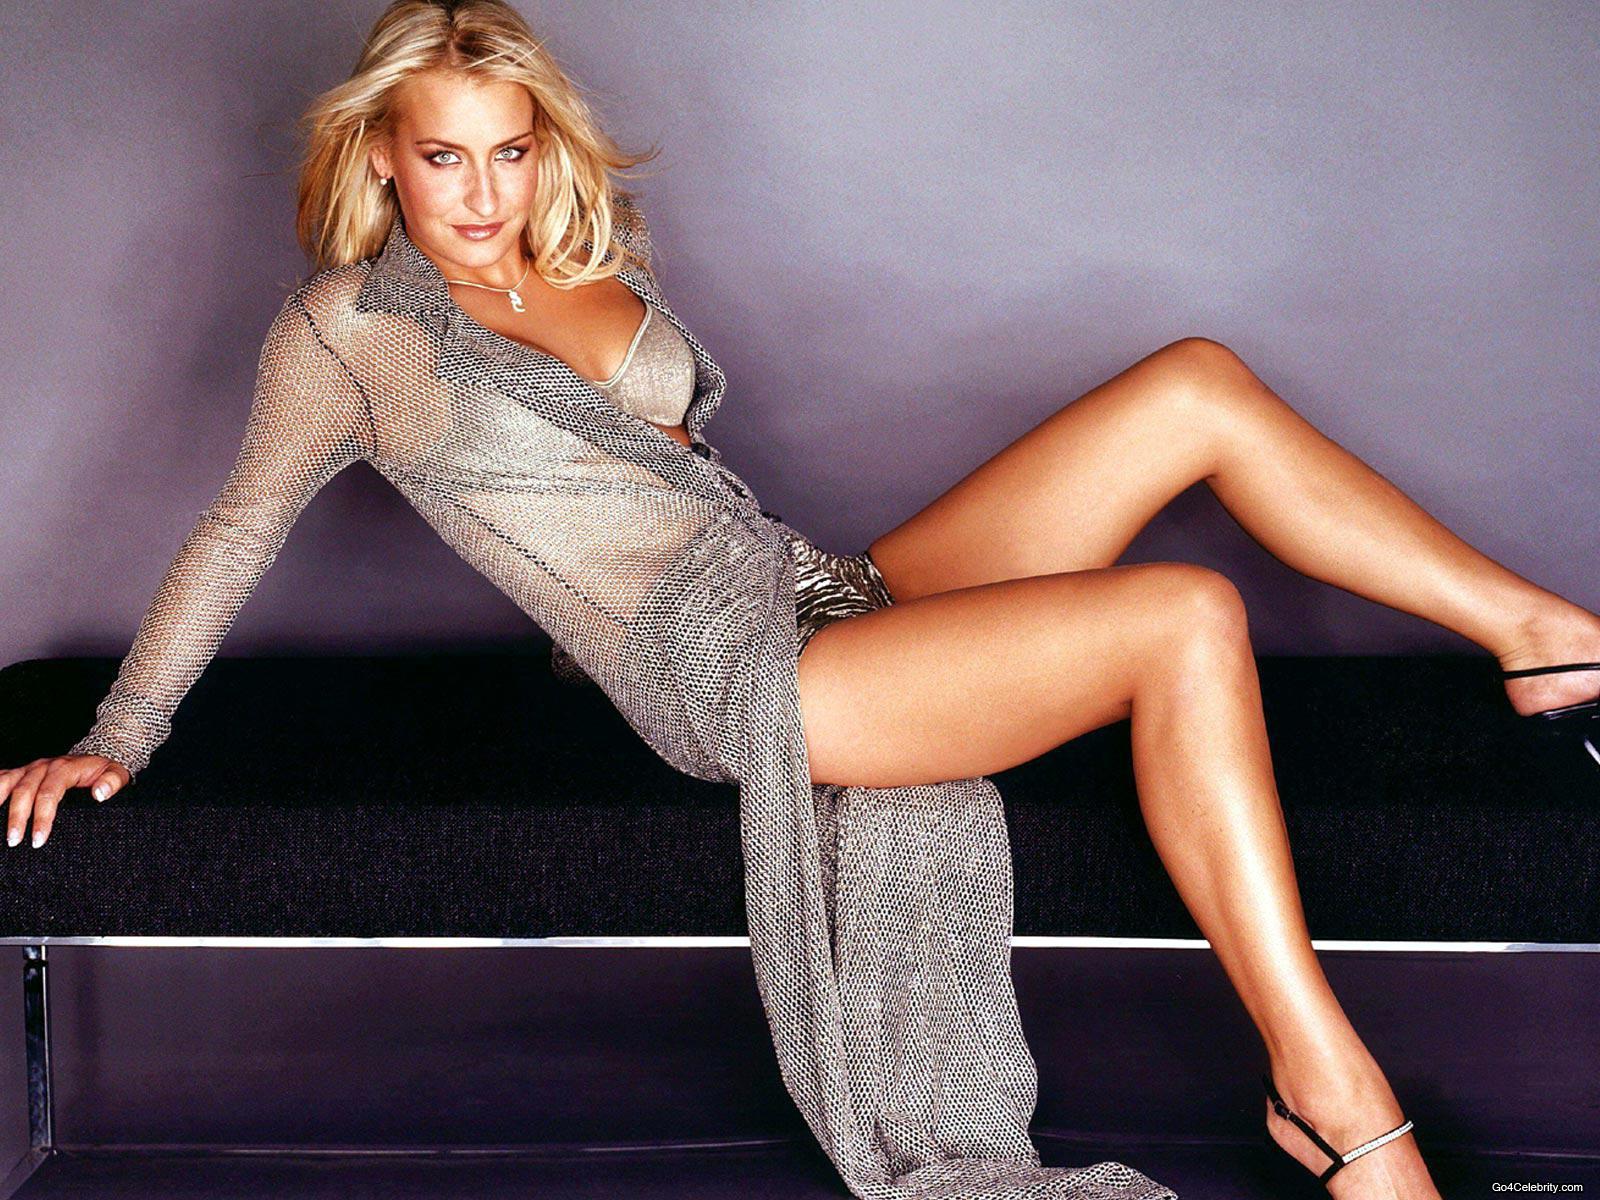 beauty celebrity: Sarah Connor hot